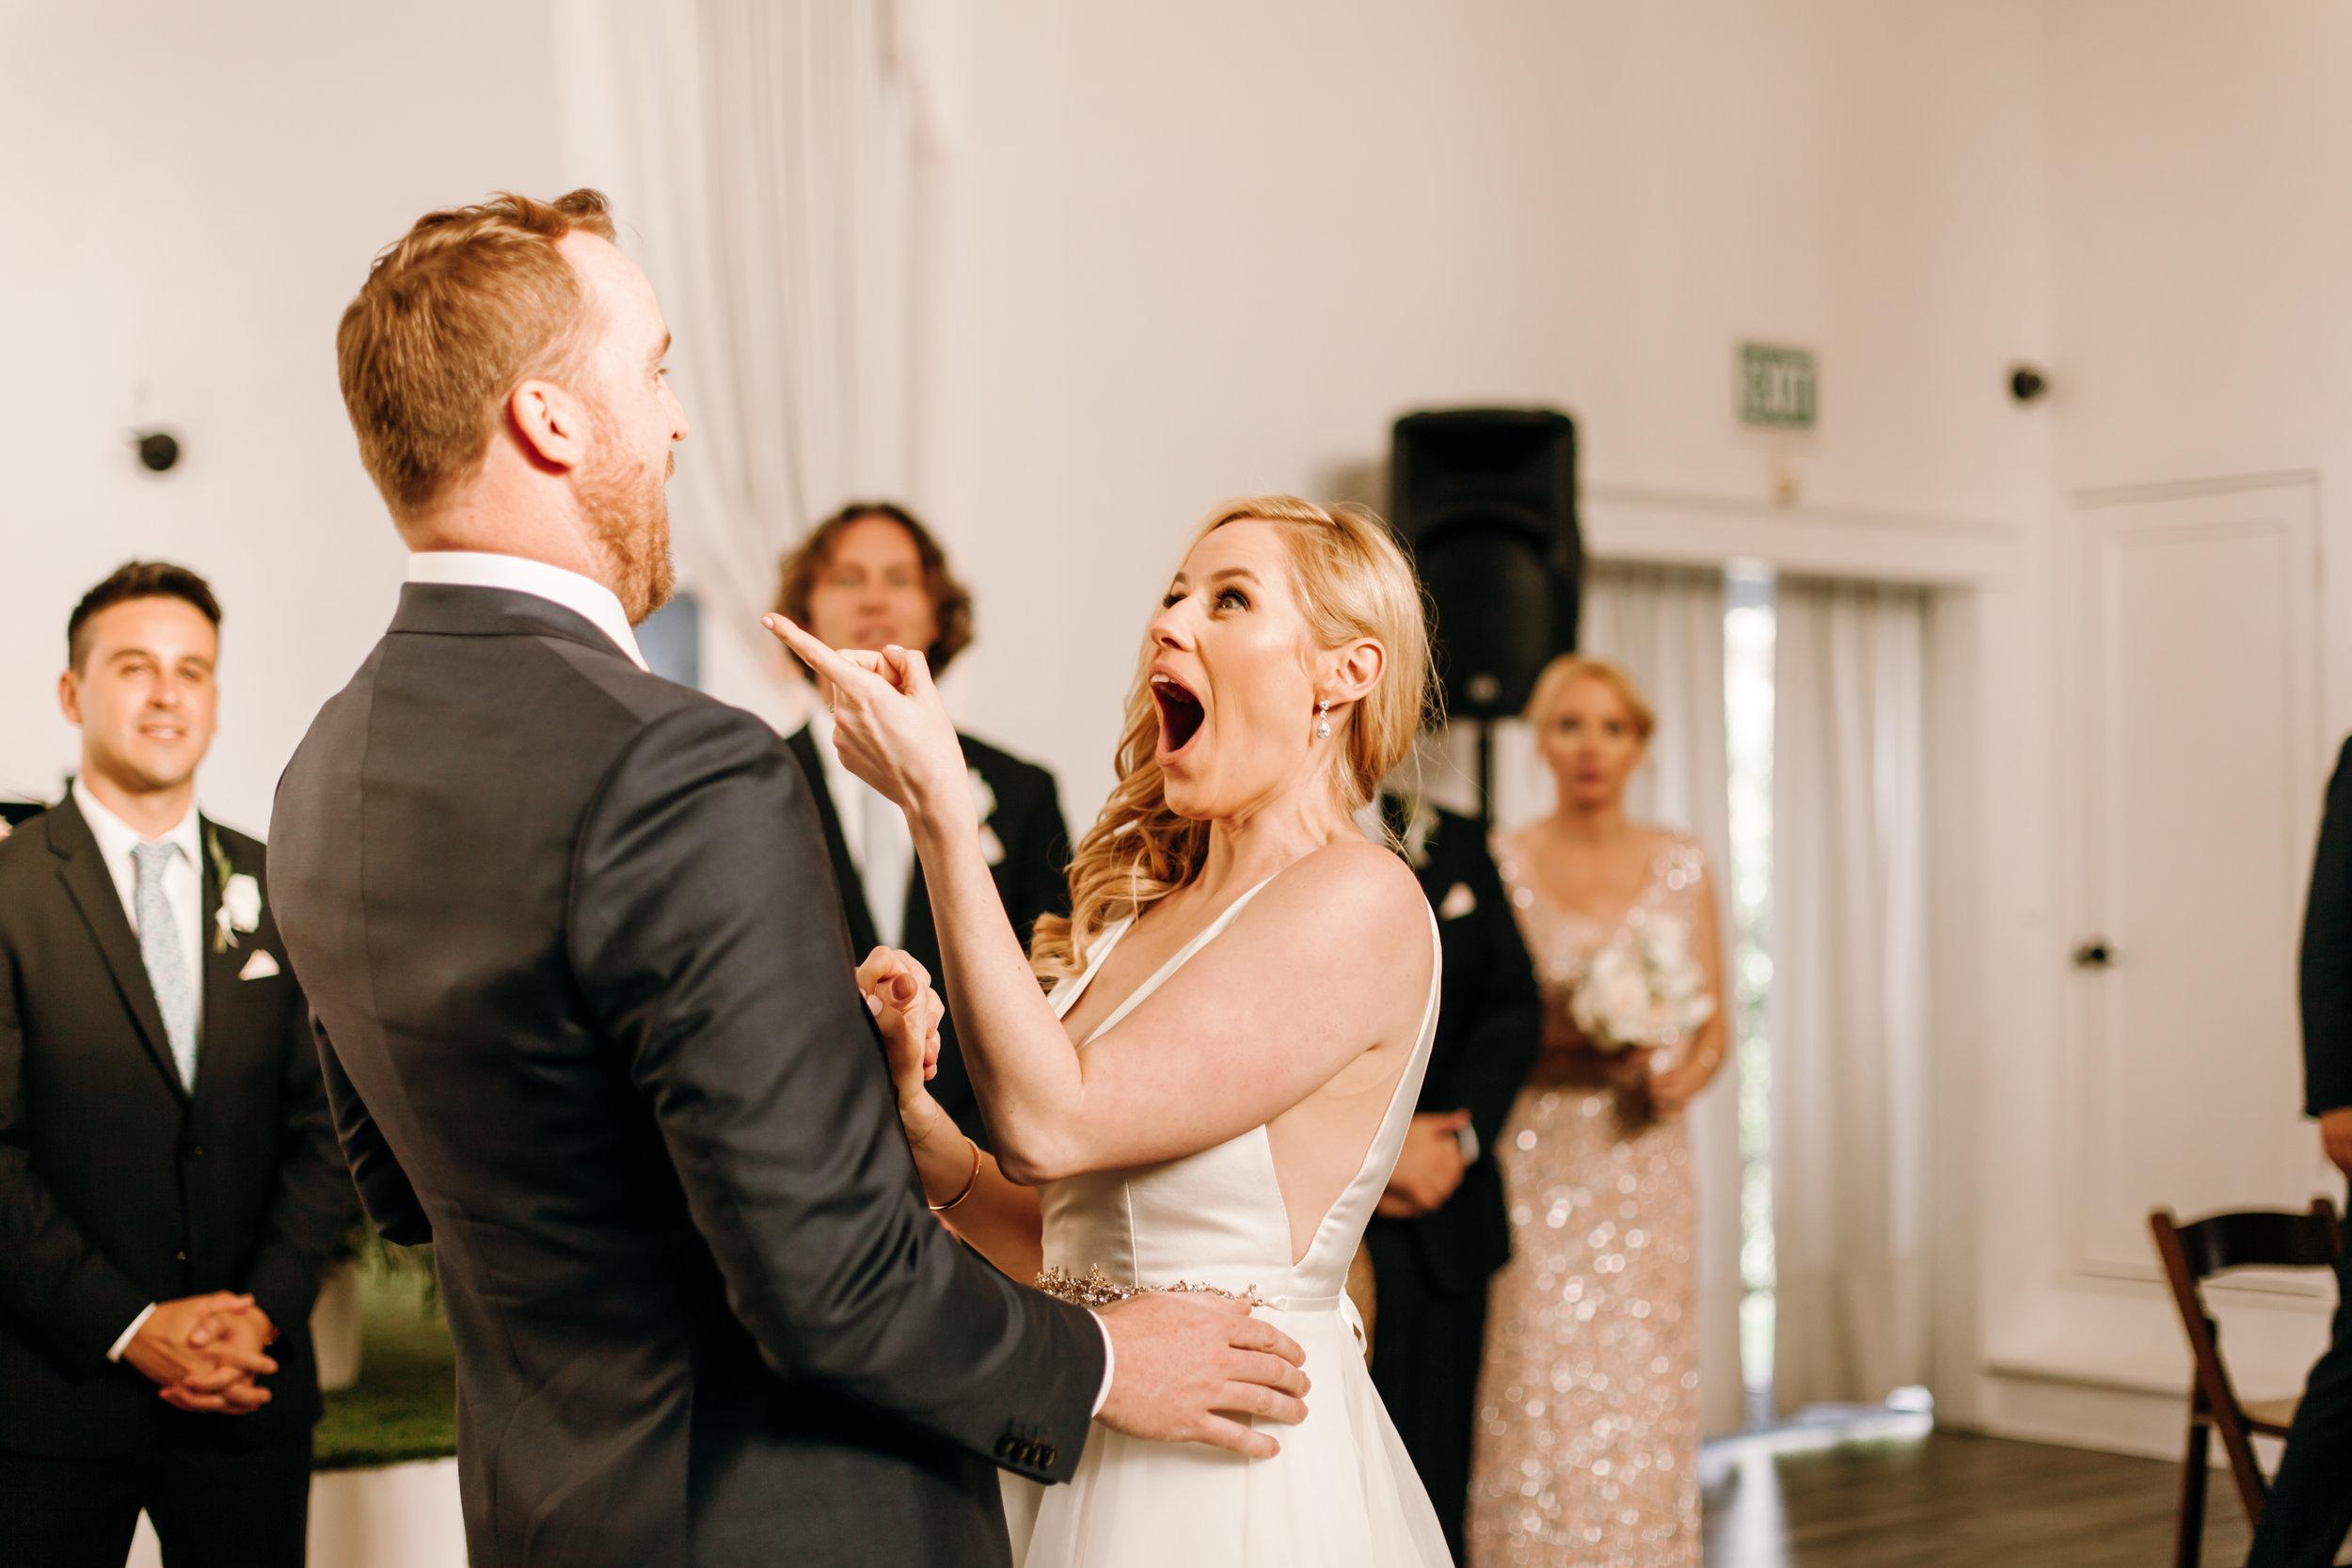 LA wedding photographer, Southern California wedding photographer, Los Angeles wedding photographer, SoCal wedding photographer, Santa Barbara wedding photographer, The York wedding